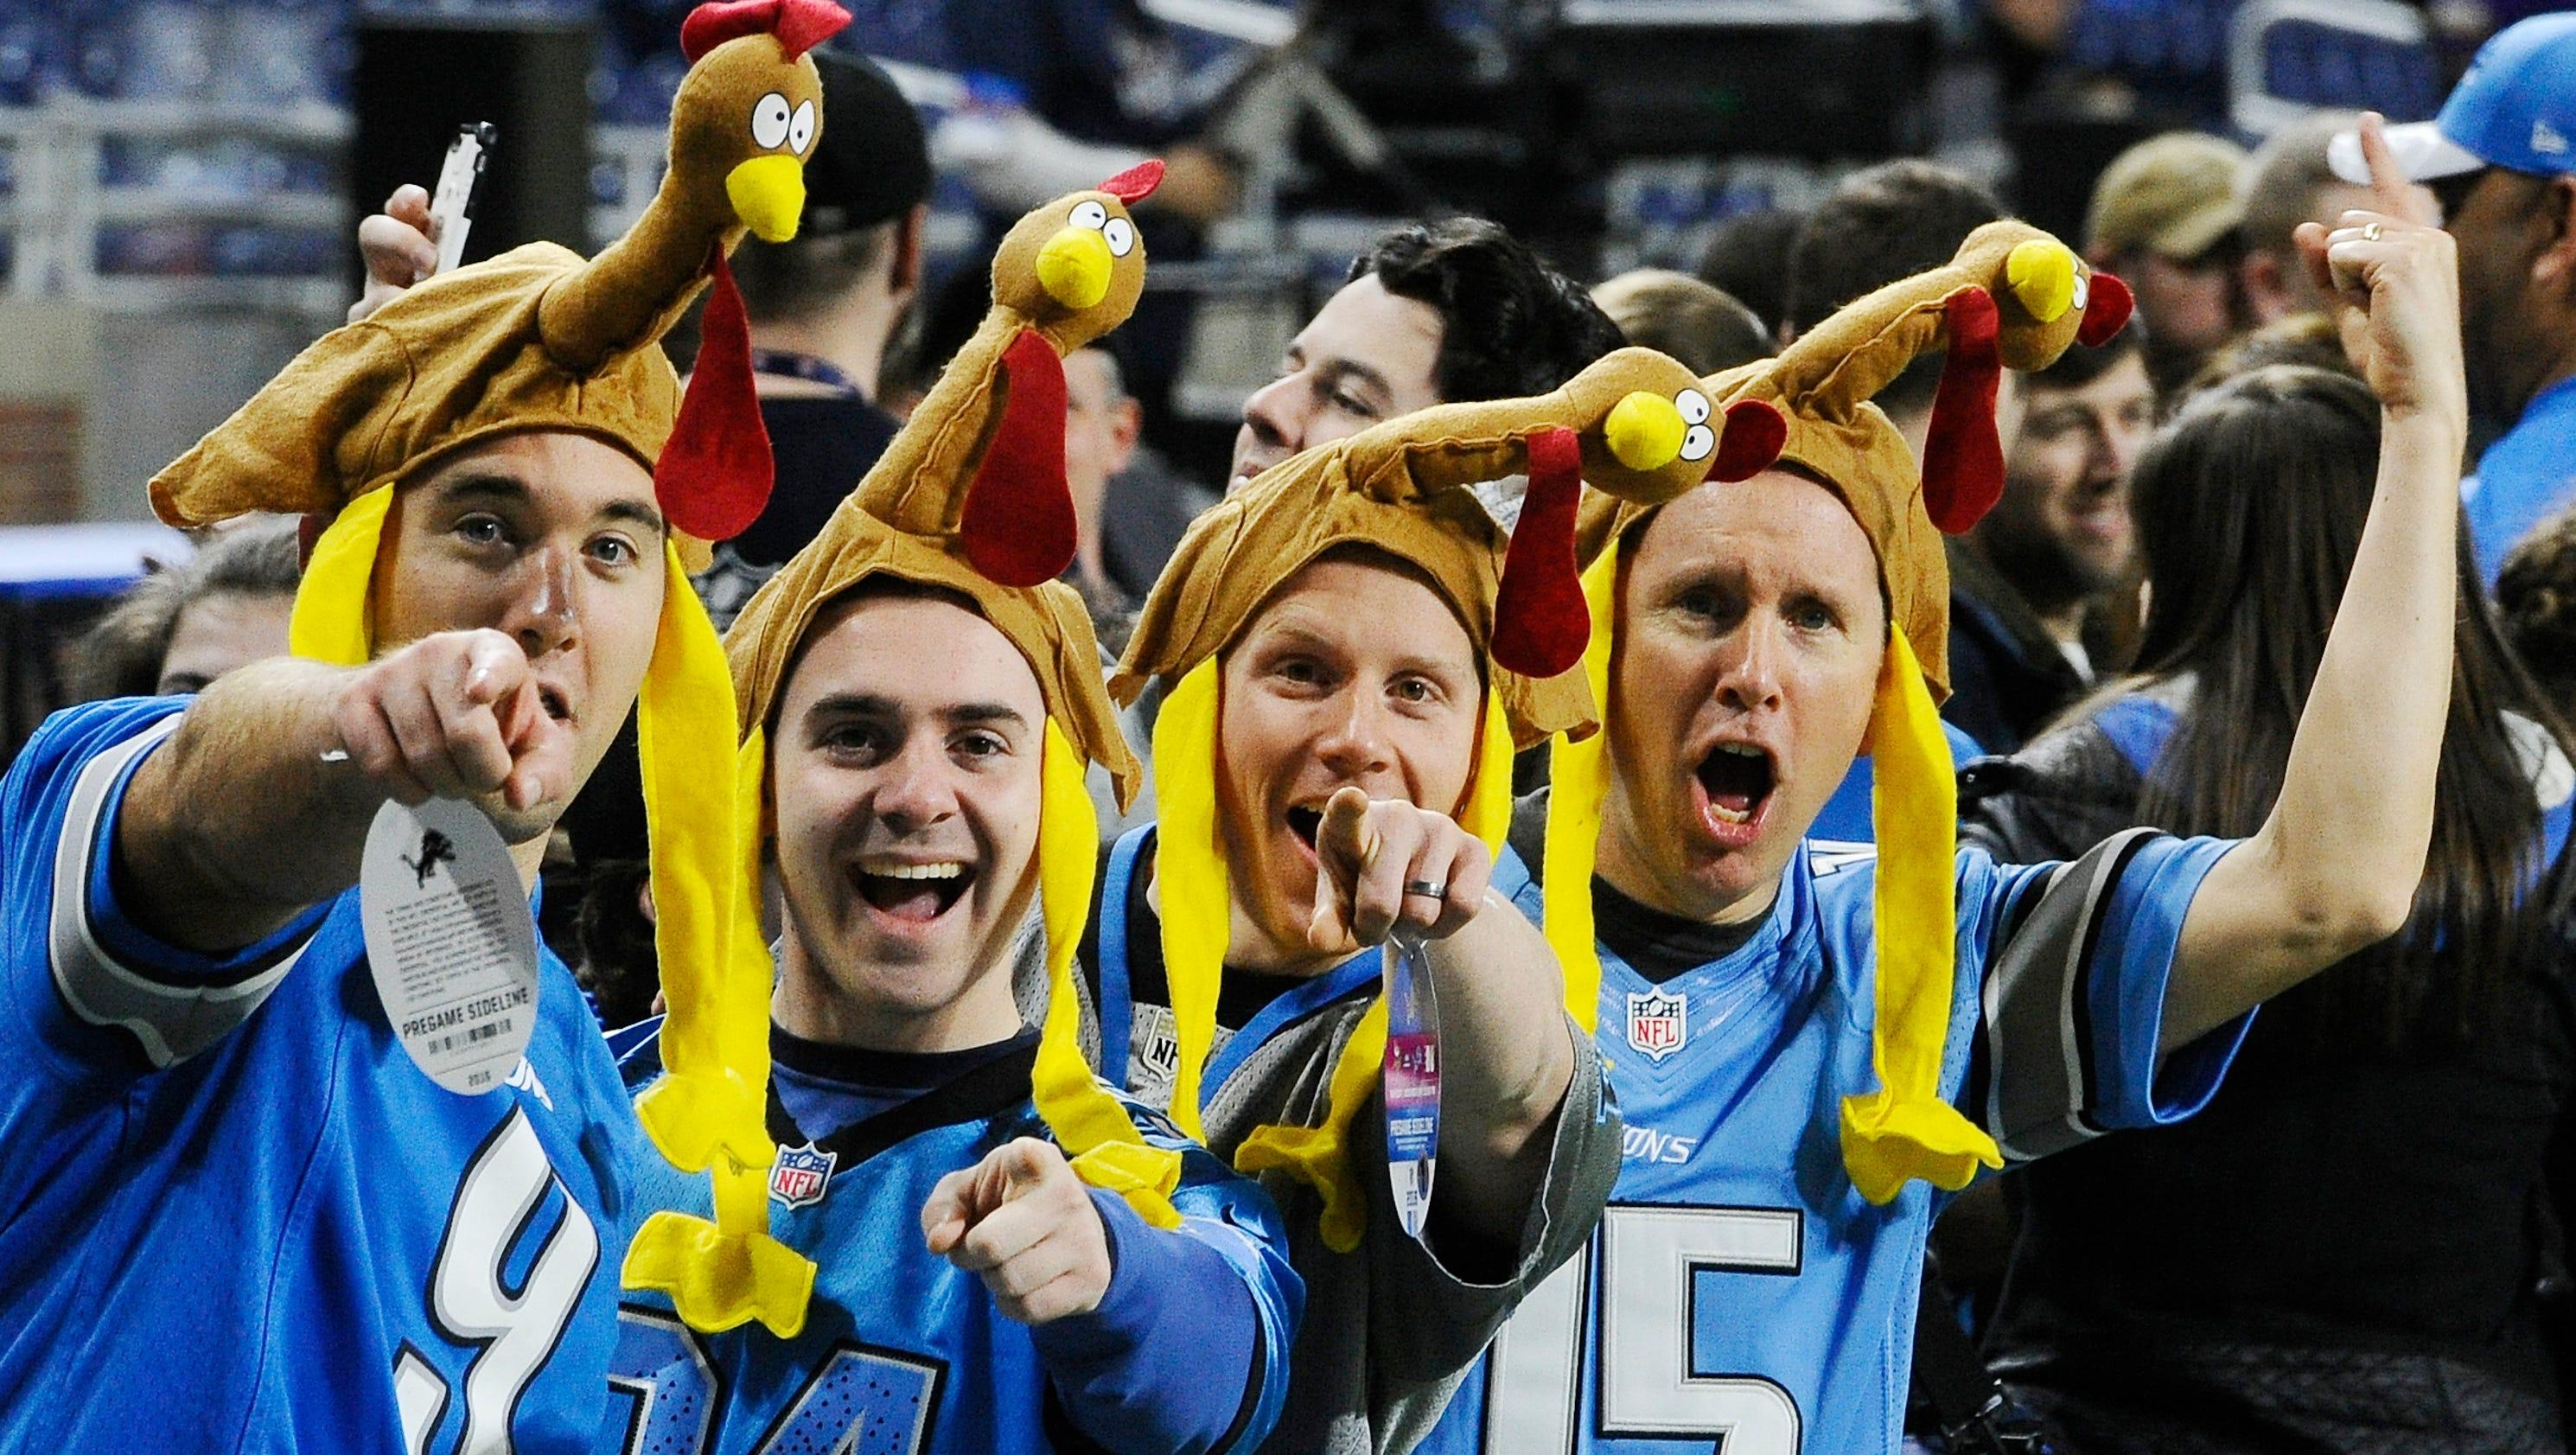 6b25e884584 dailymail.co.uk Lions take on Vikings on Thanksgiving Day